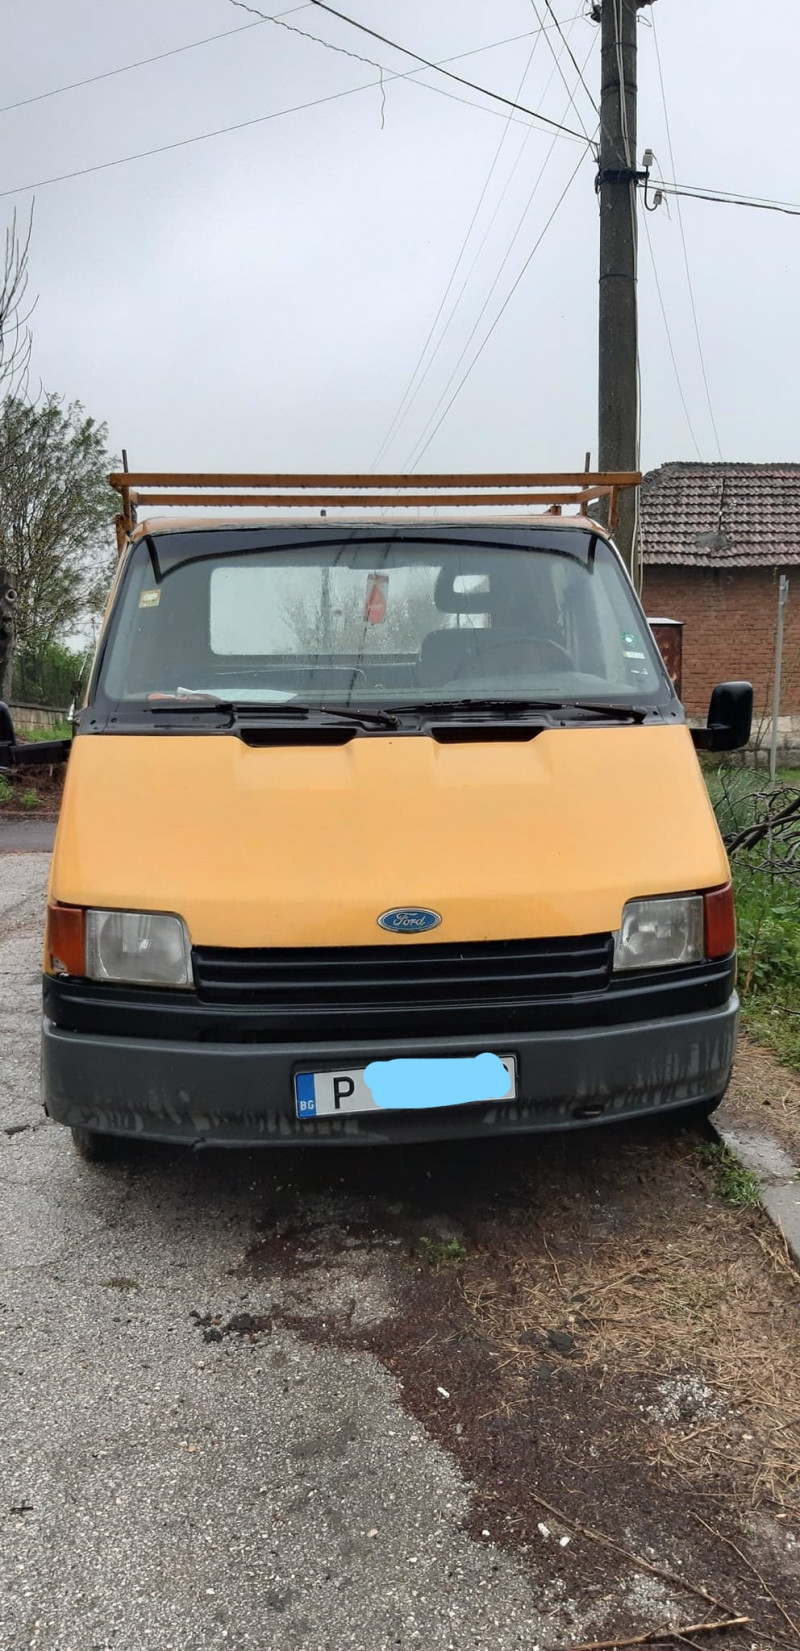 2- Ford Tranisit